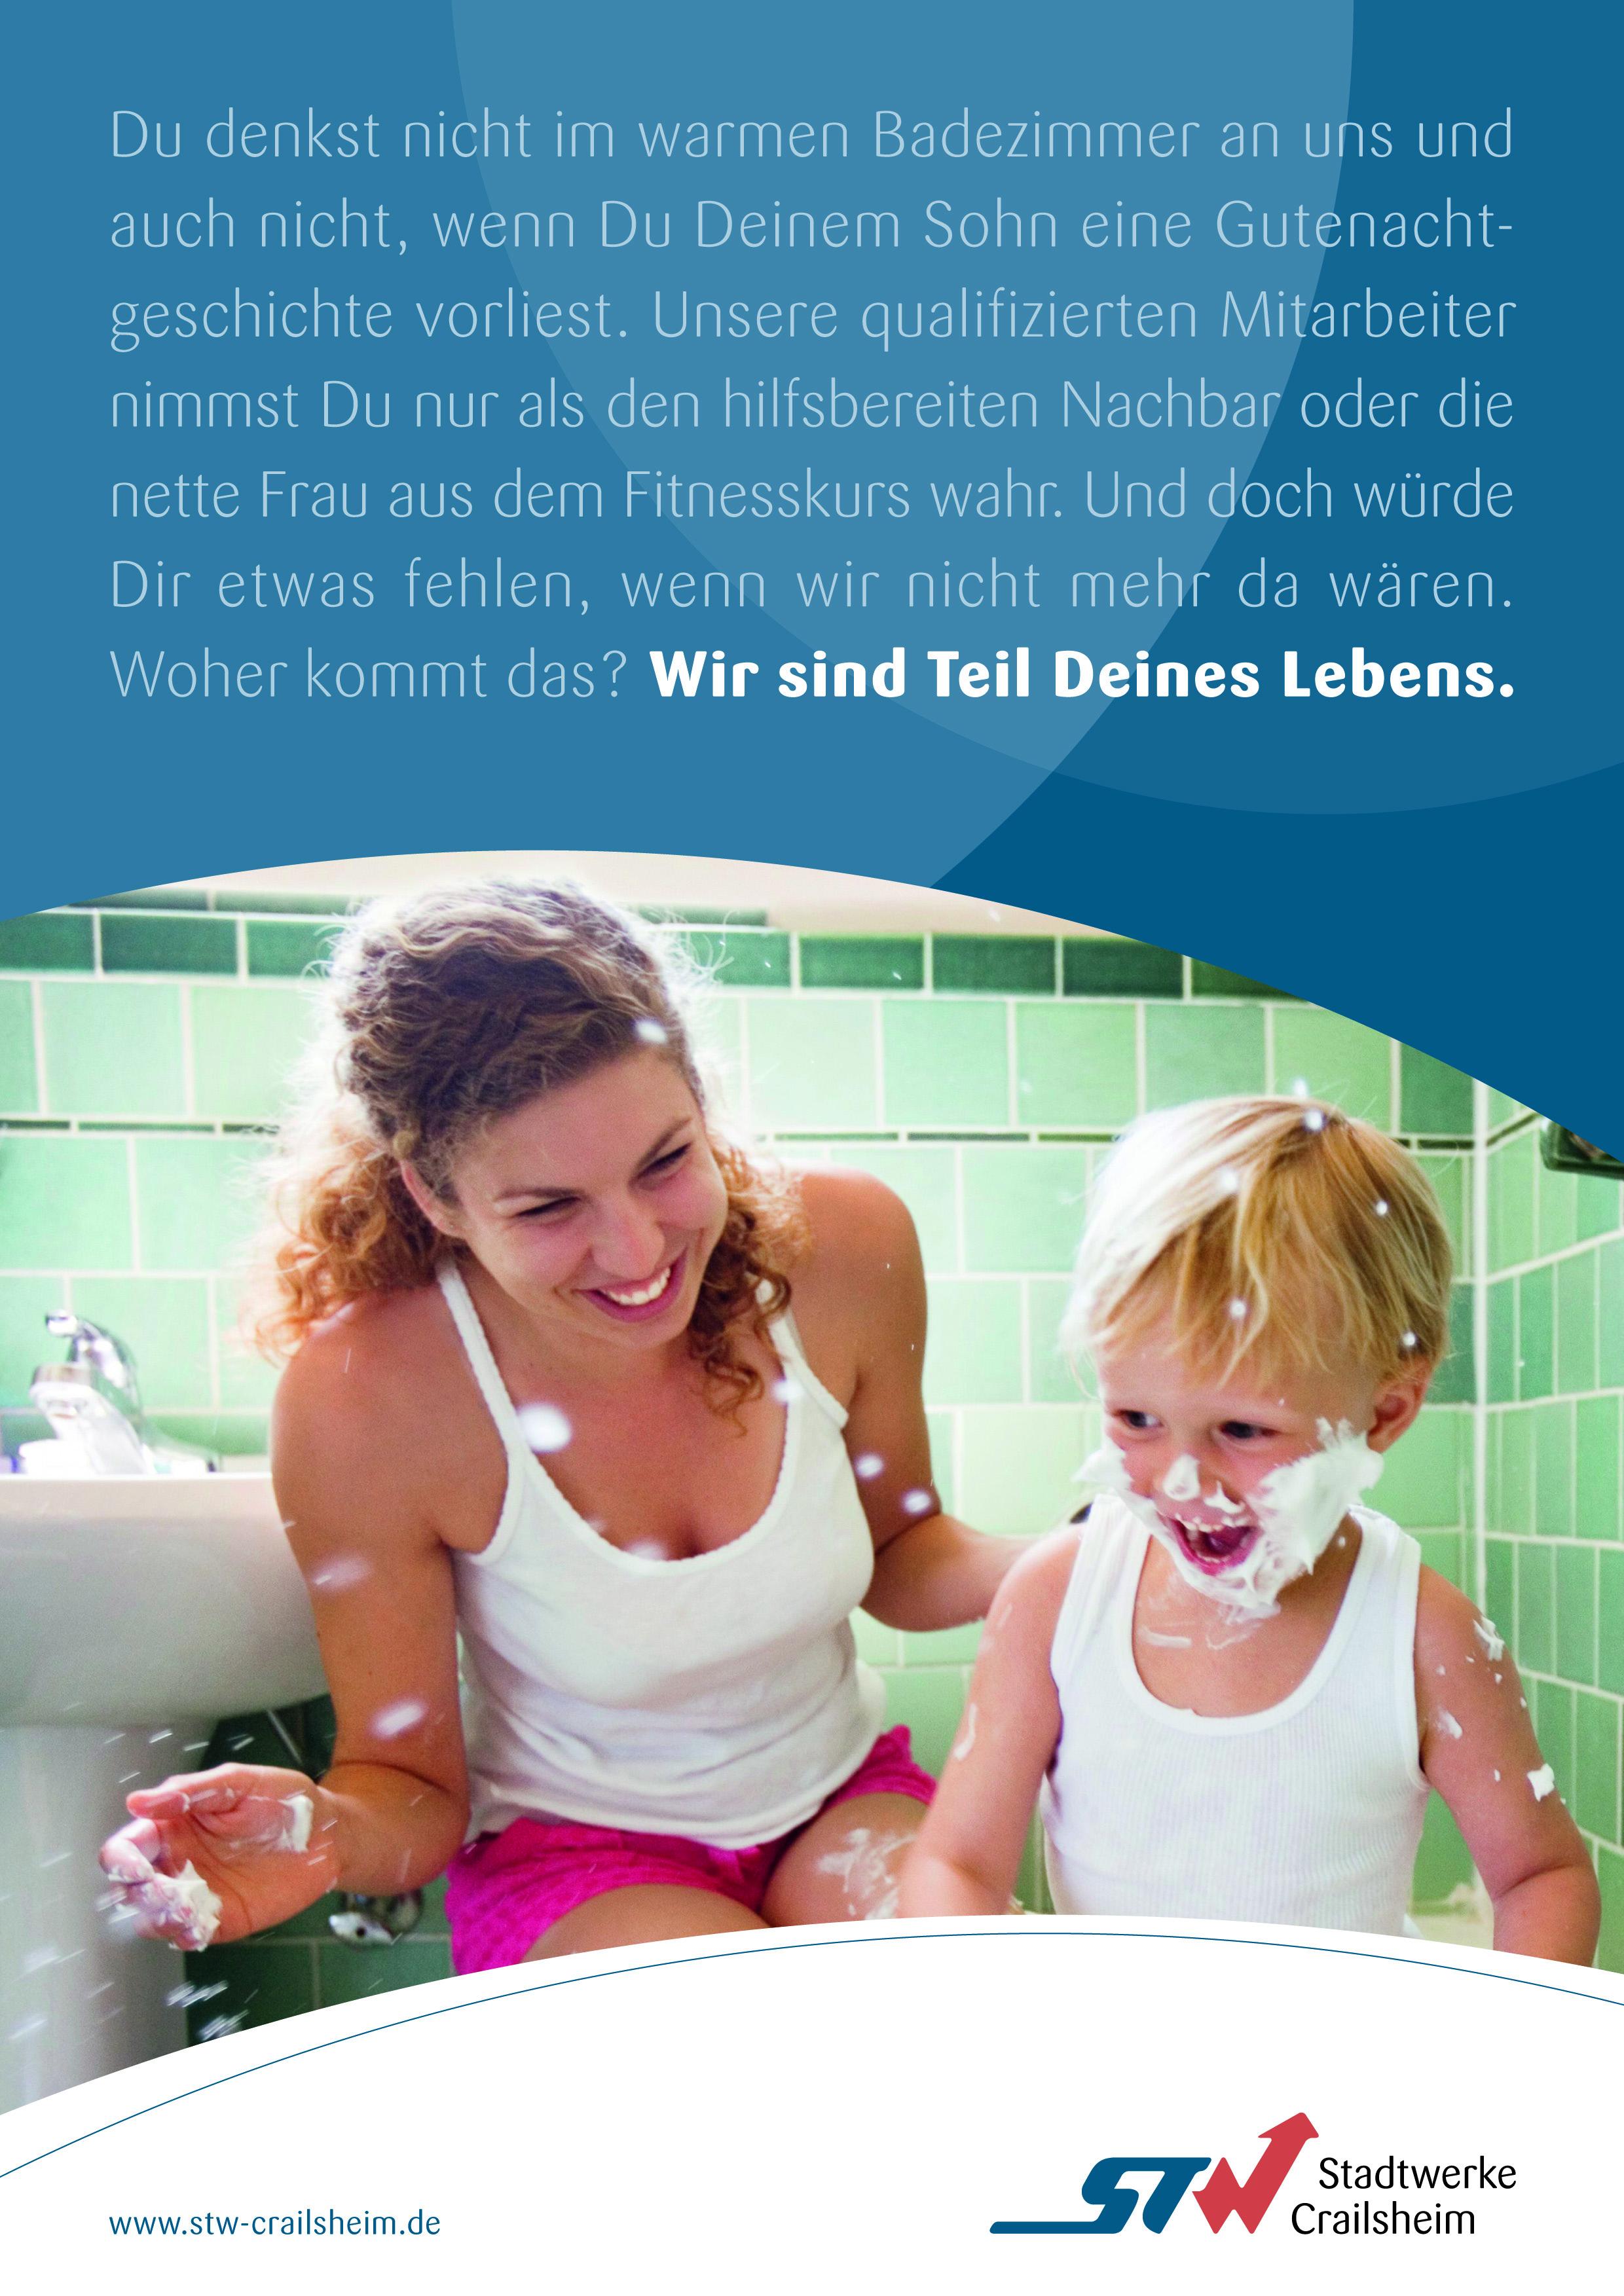 Stadtwerke Crailsheim, Imagekampagne